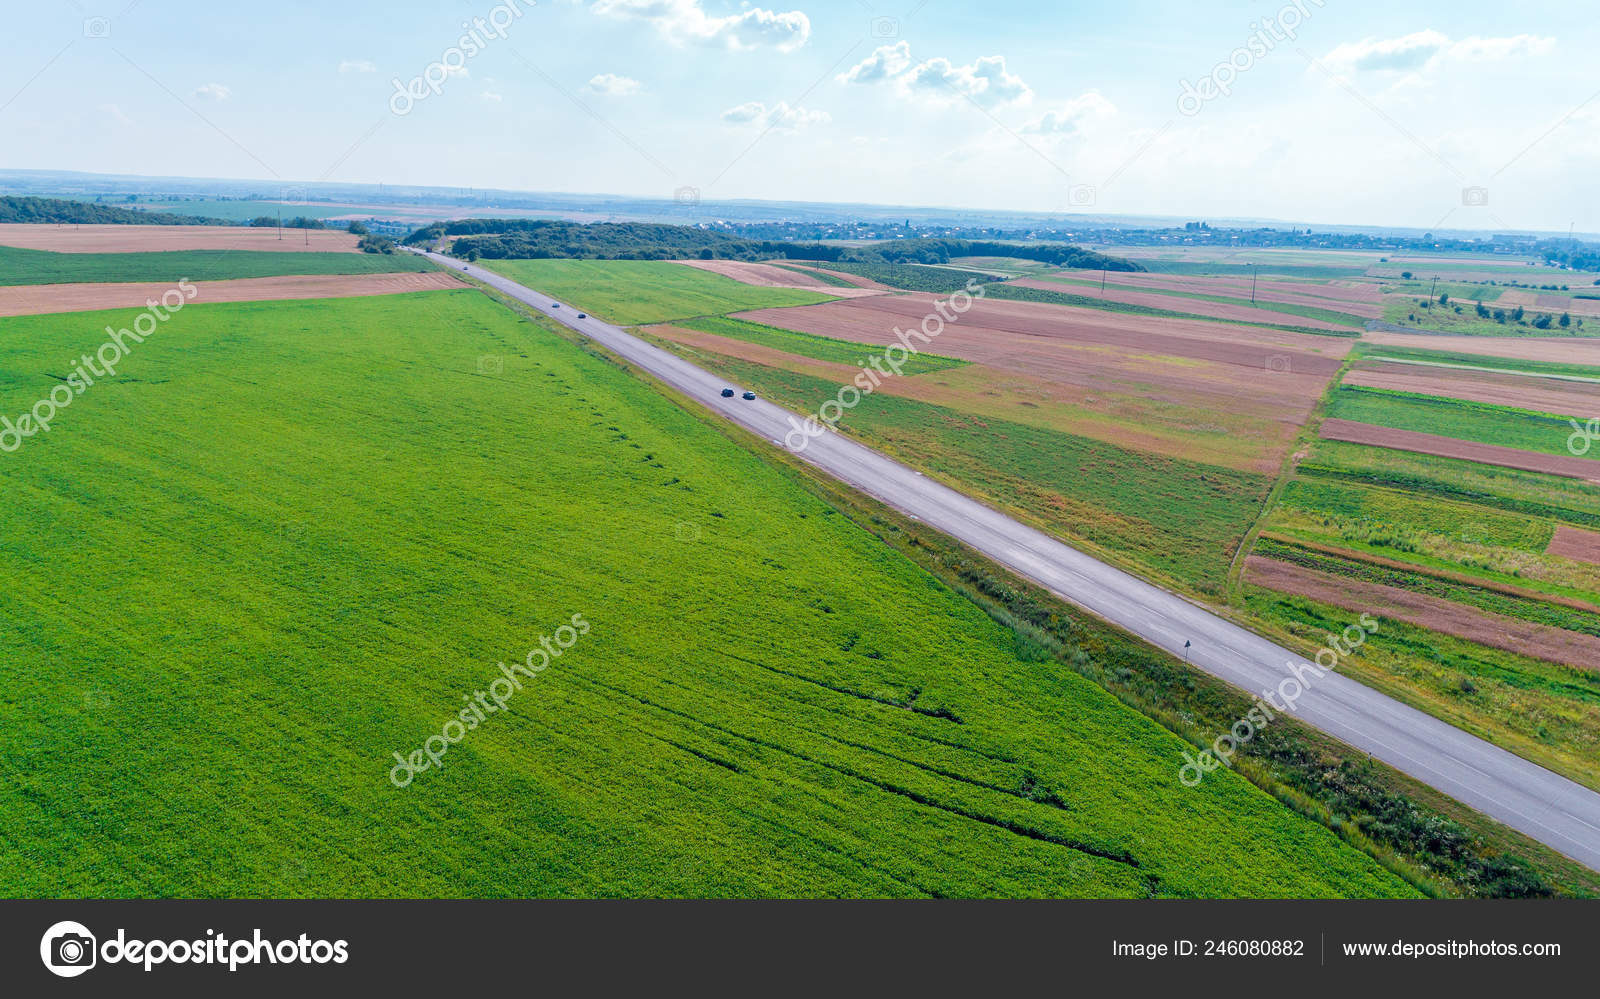 Aerial Shot Car Road Drone Point View Stock Photo C Ivantsov 246080882